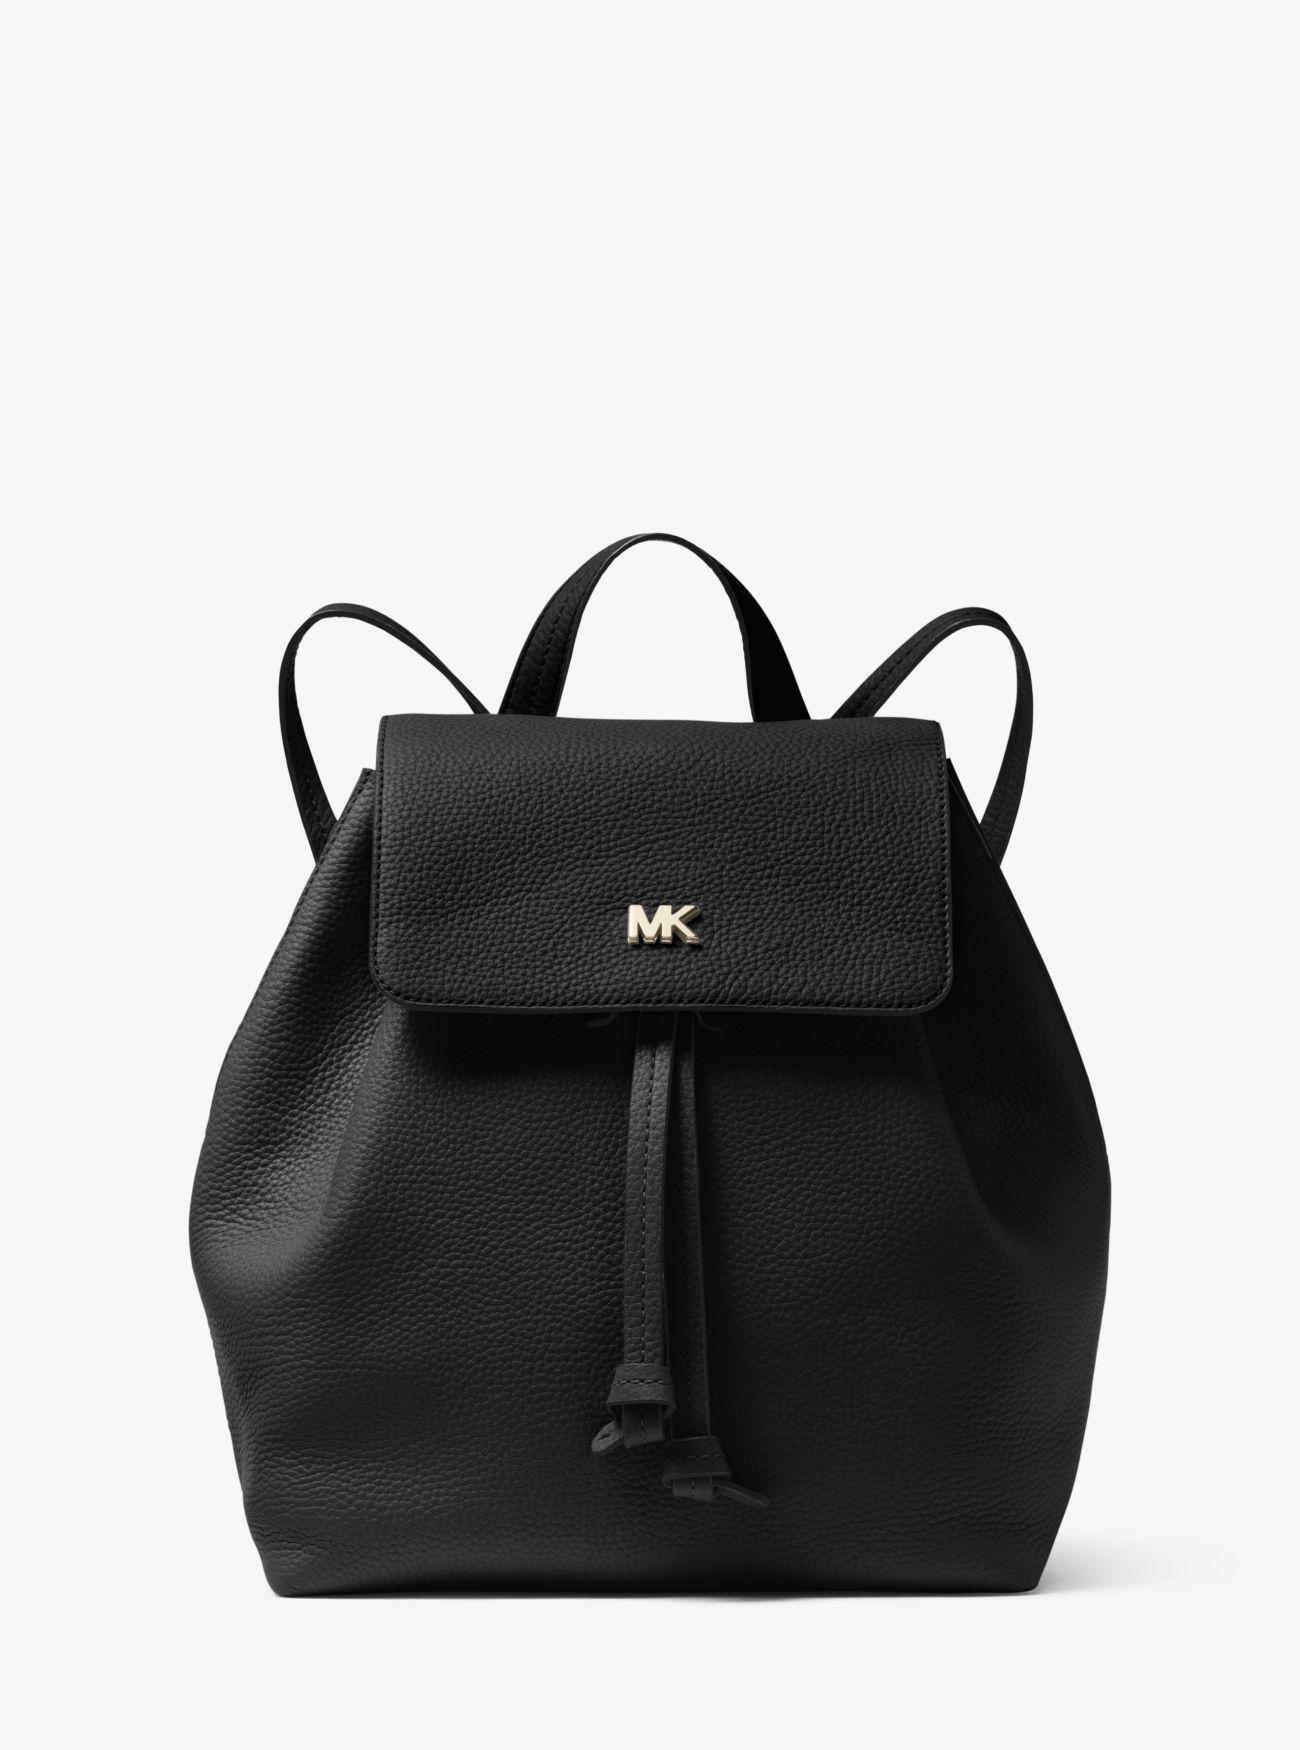 07742df8043f Junie Medium Pebbled Leather Backpack | Purses I want | Leather ...